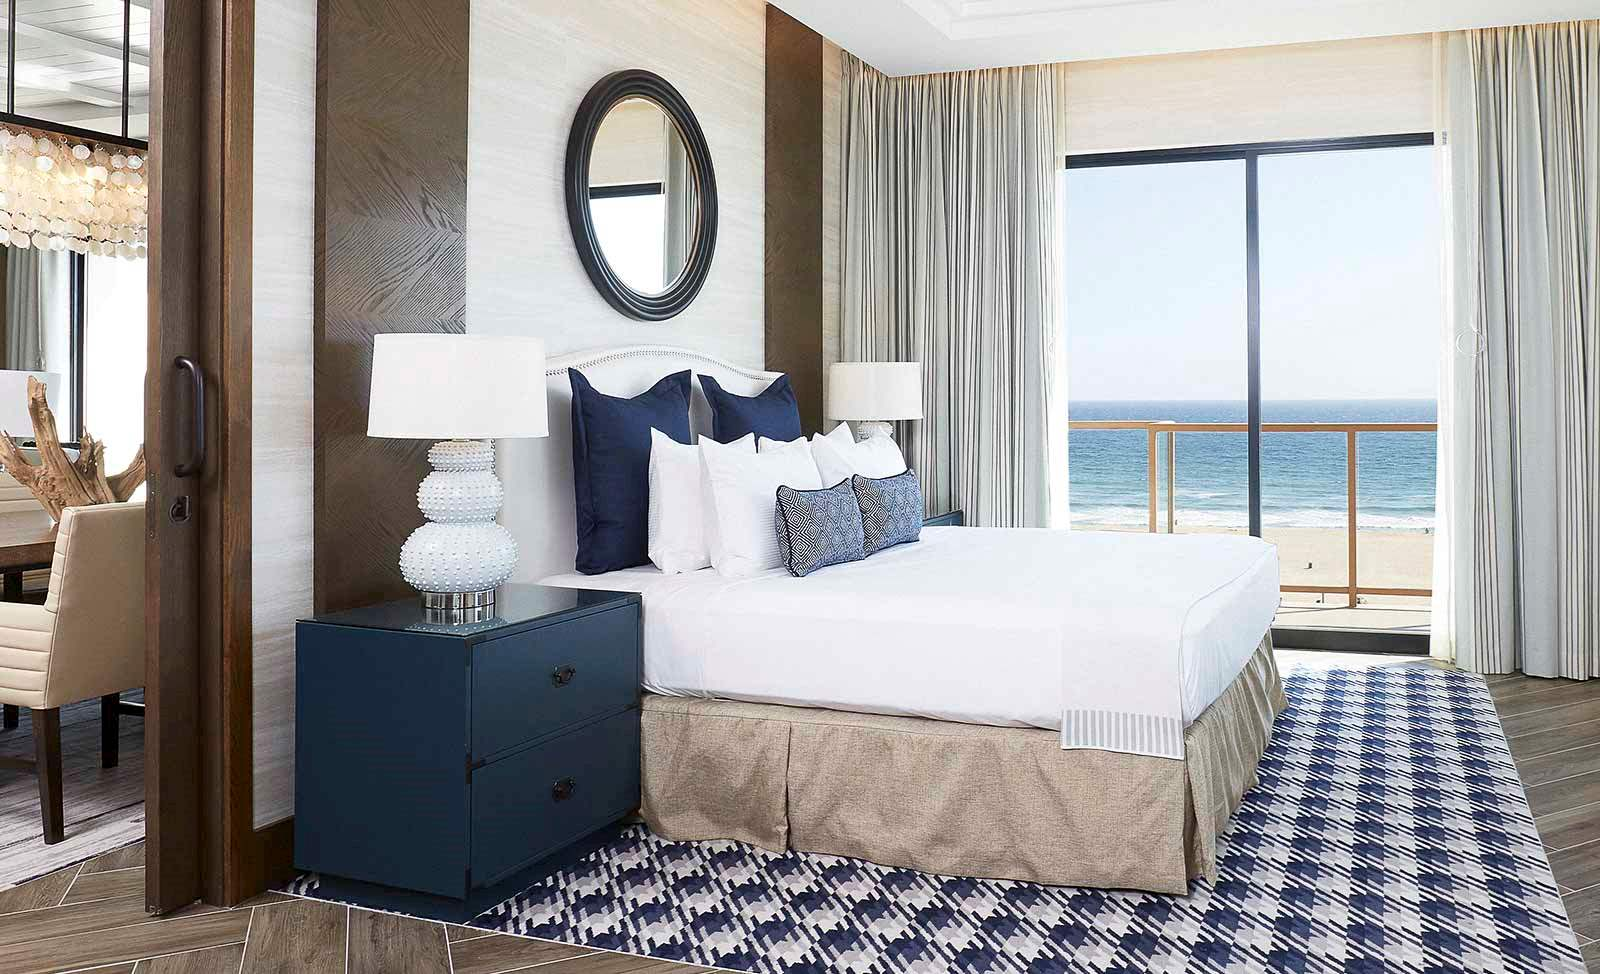 Luxury Hotel in Huntington Beach - The Waterfront Beach Resort